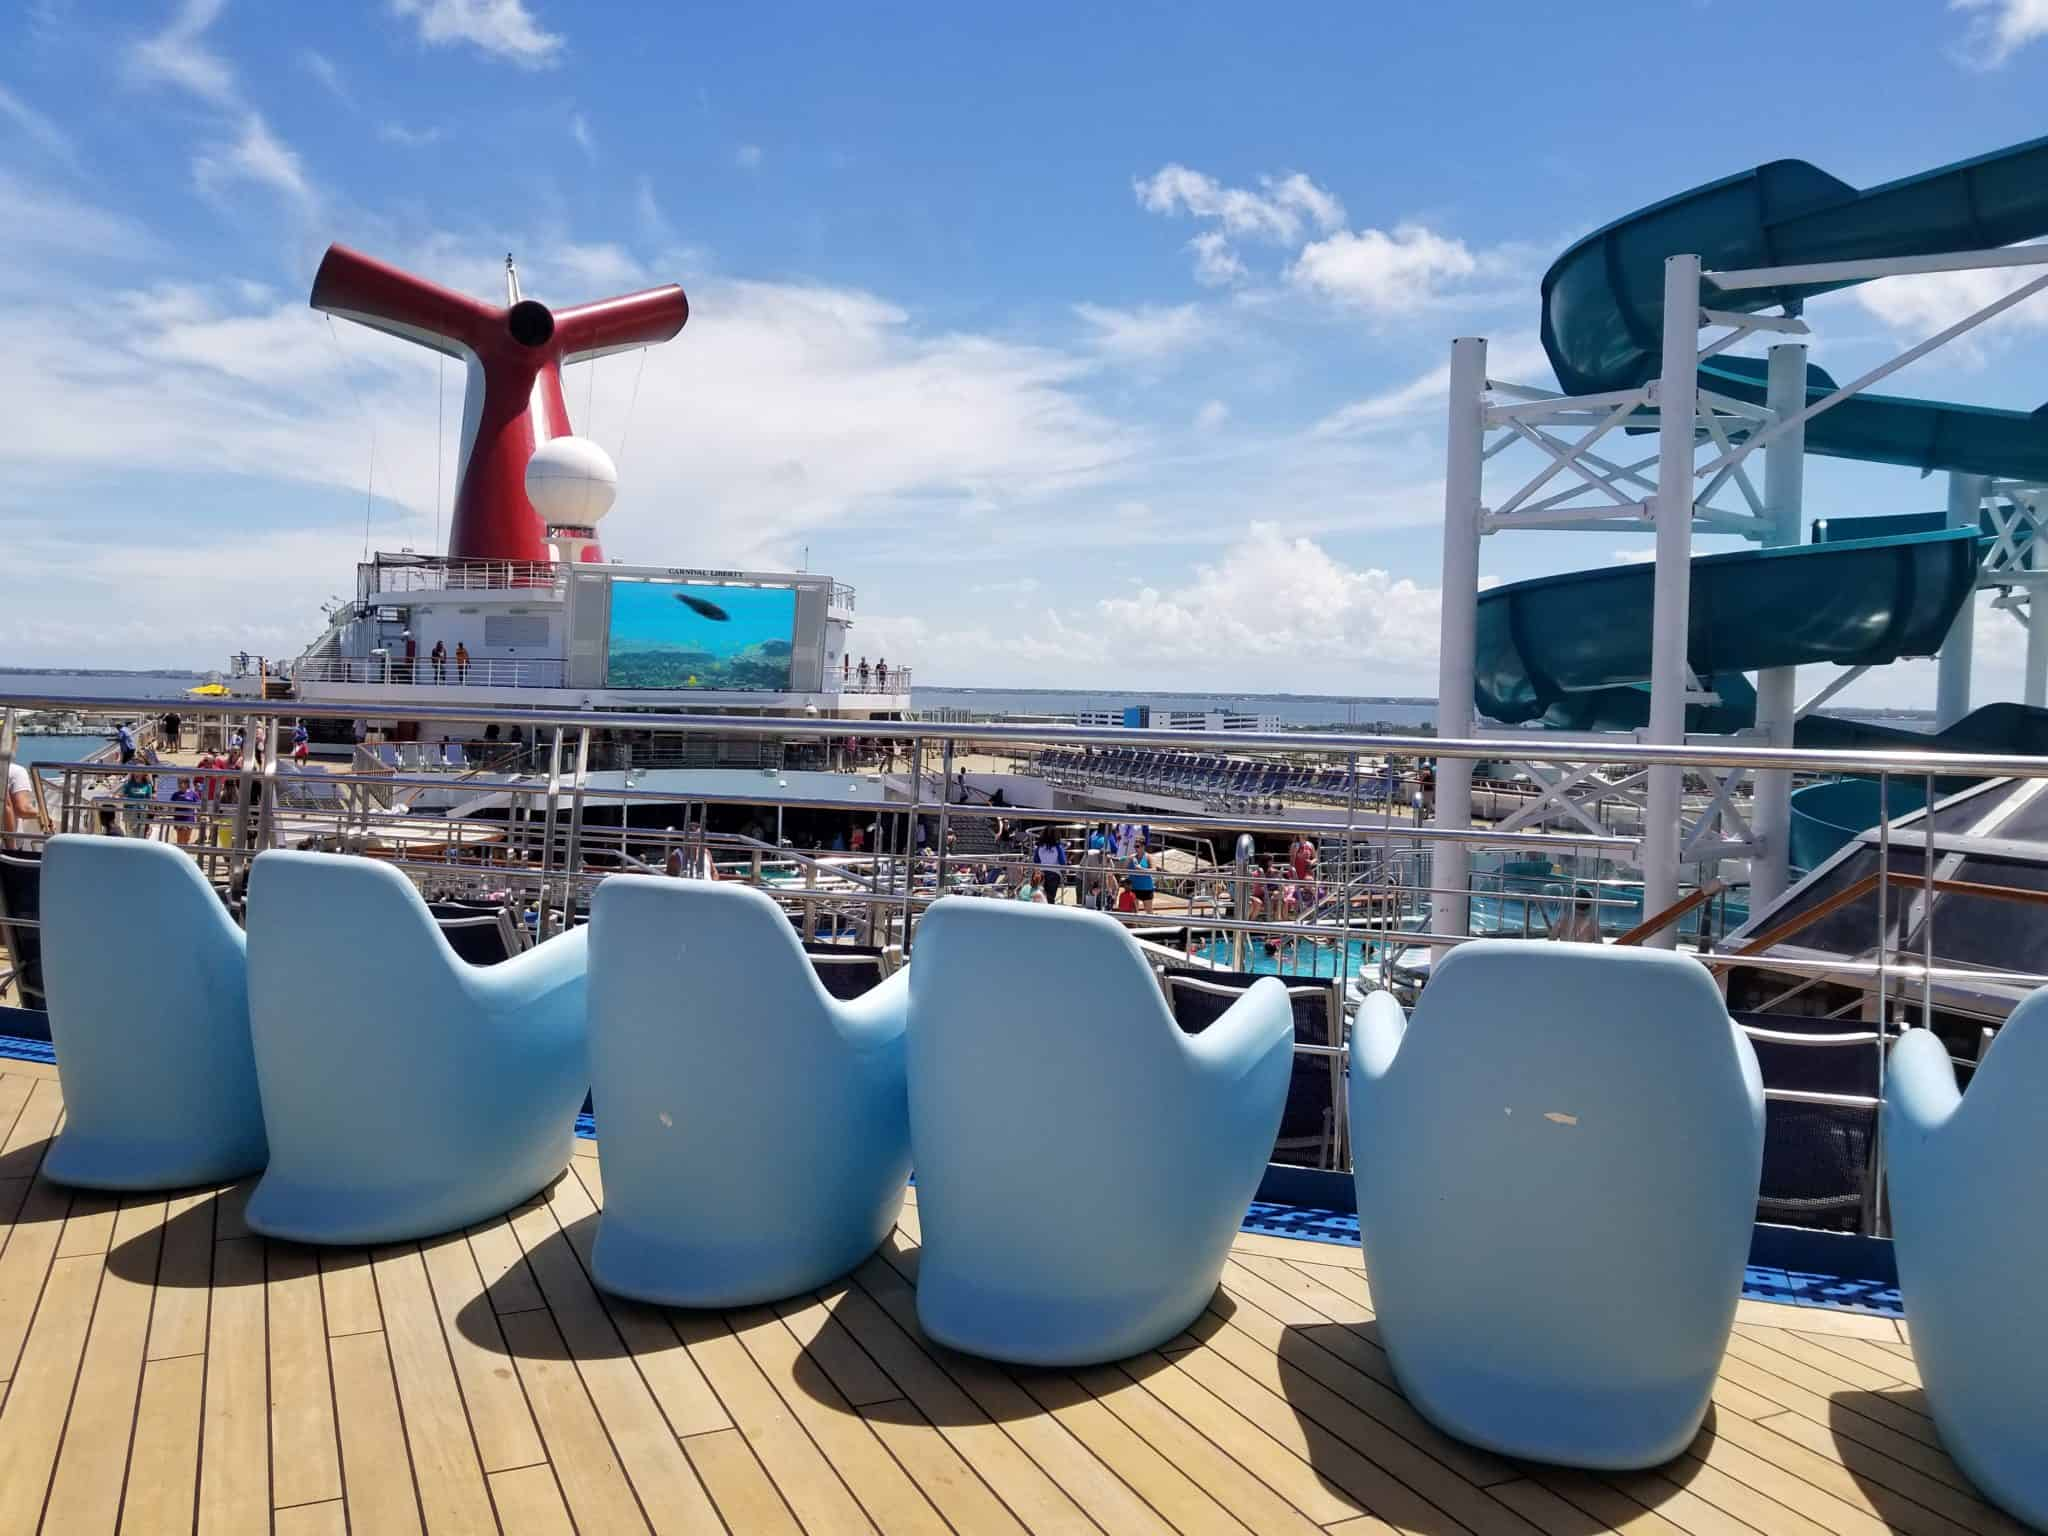 Family Cruise Day 1 Carnival Liberty Embarkation